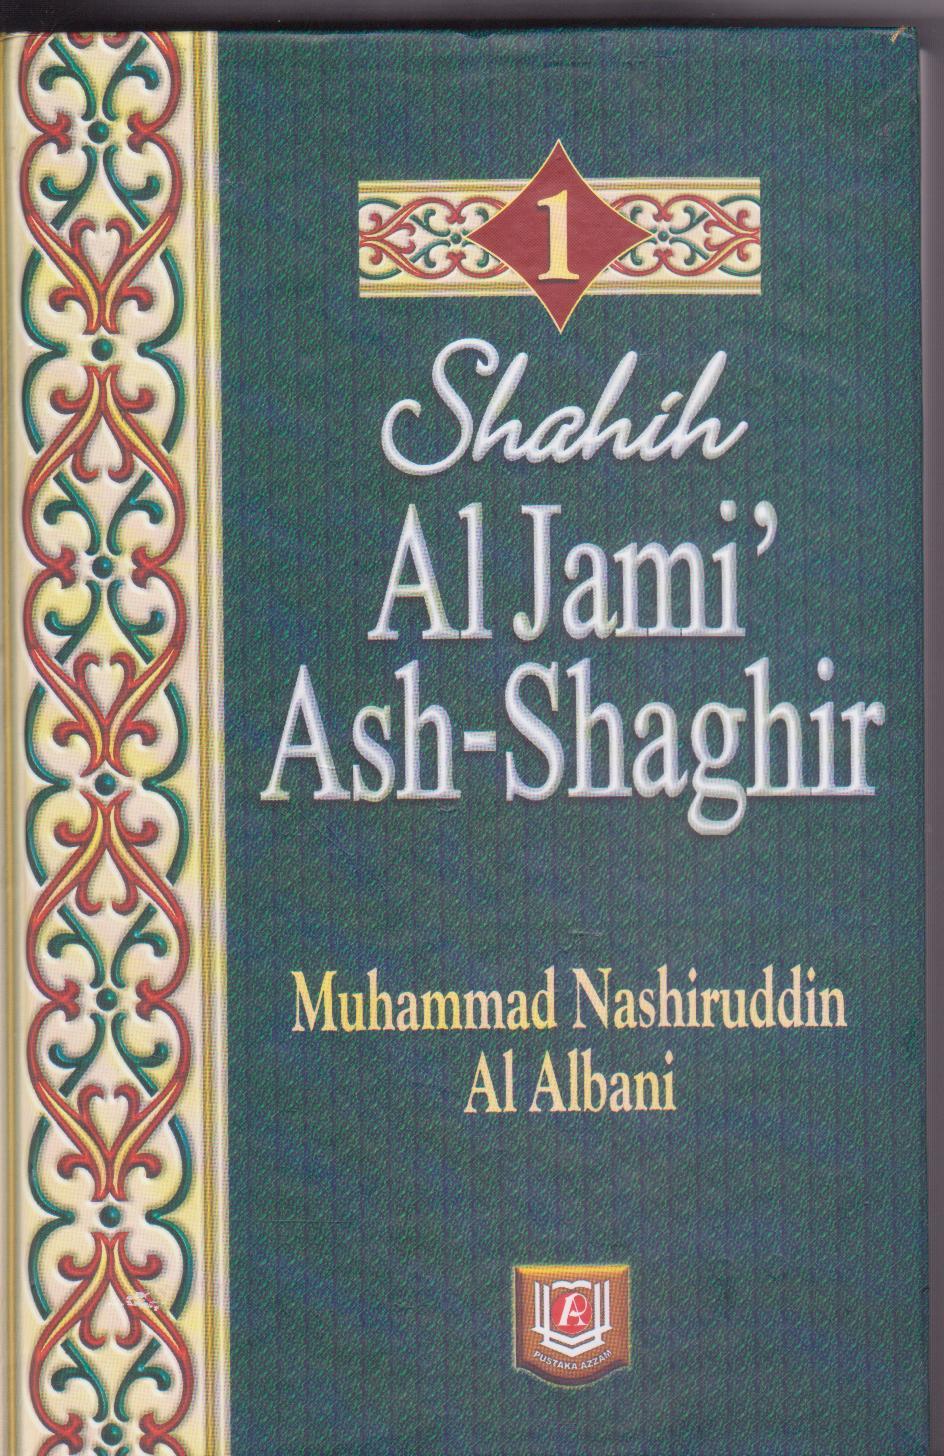 http://1.bp.blogspot.com/_6mObCzDReWI/TFkvJZFghcI/AAAAAAAAAz0/gNY2Cqn89wA/s1600/Shahih+Al+Jami%27+Ash-Shaghir+1.jpg